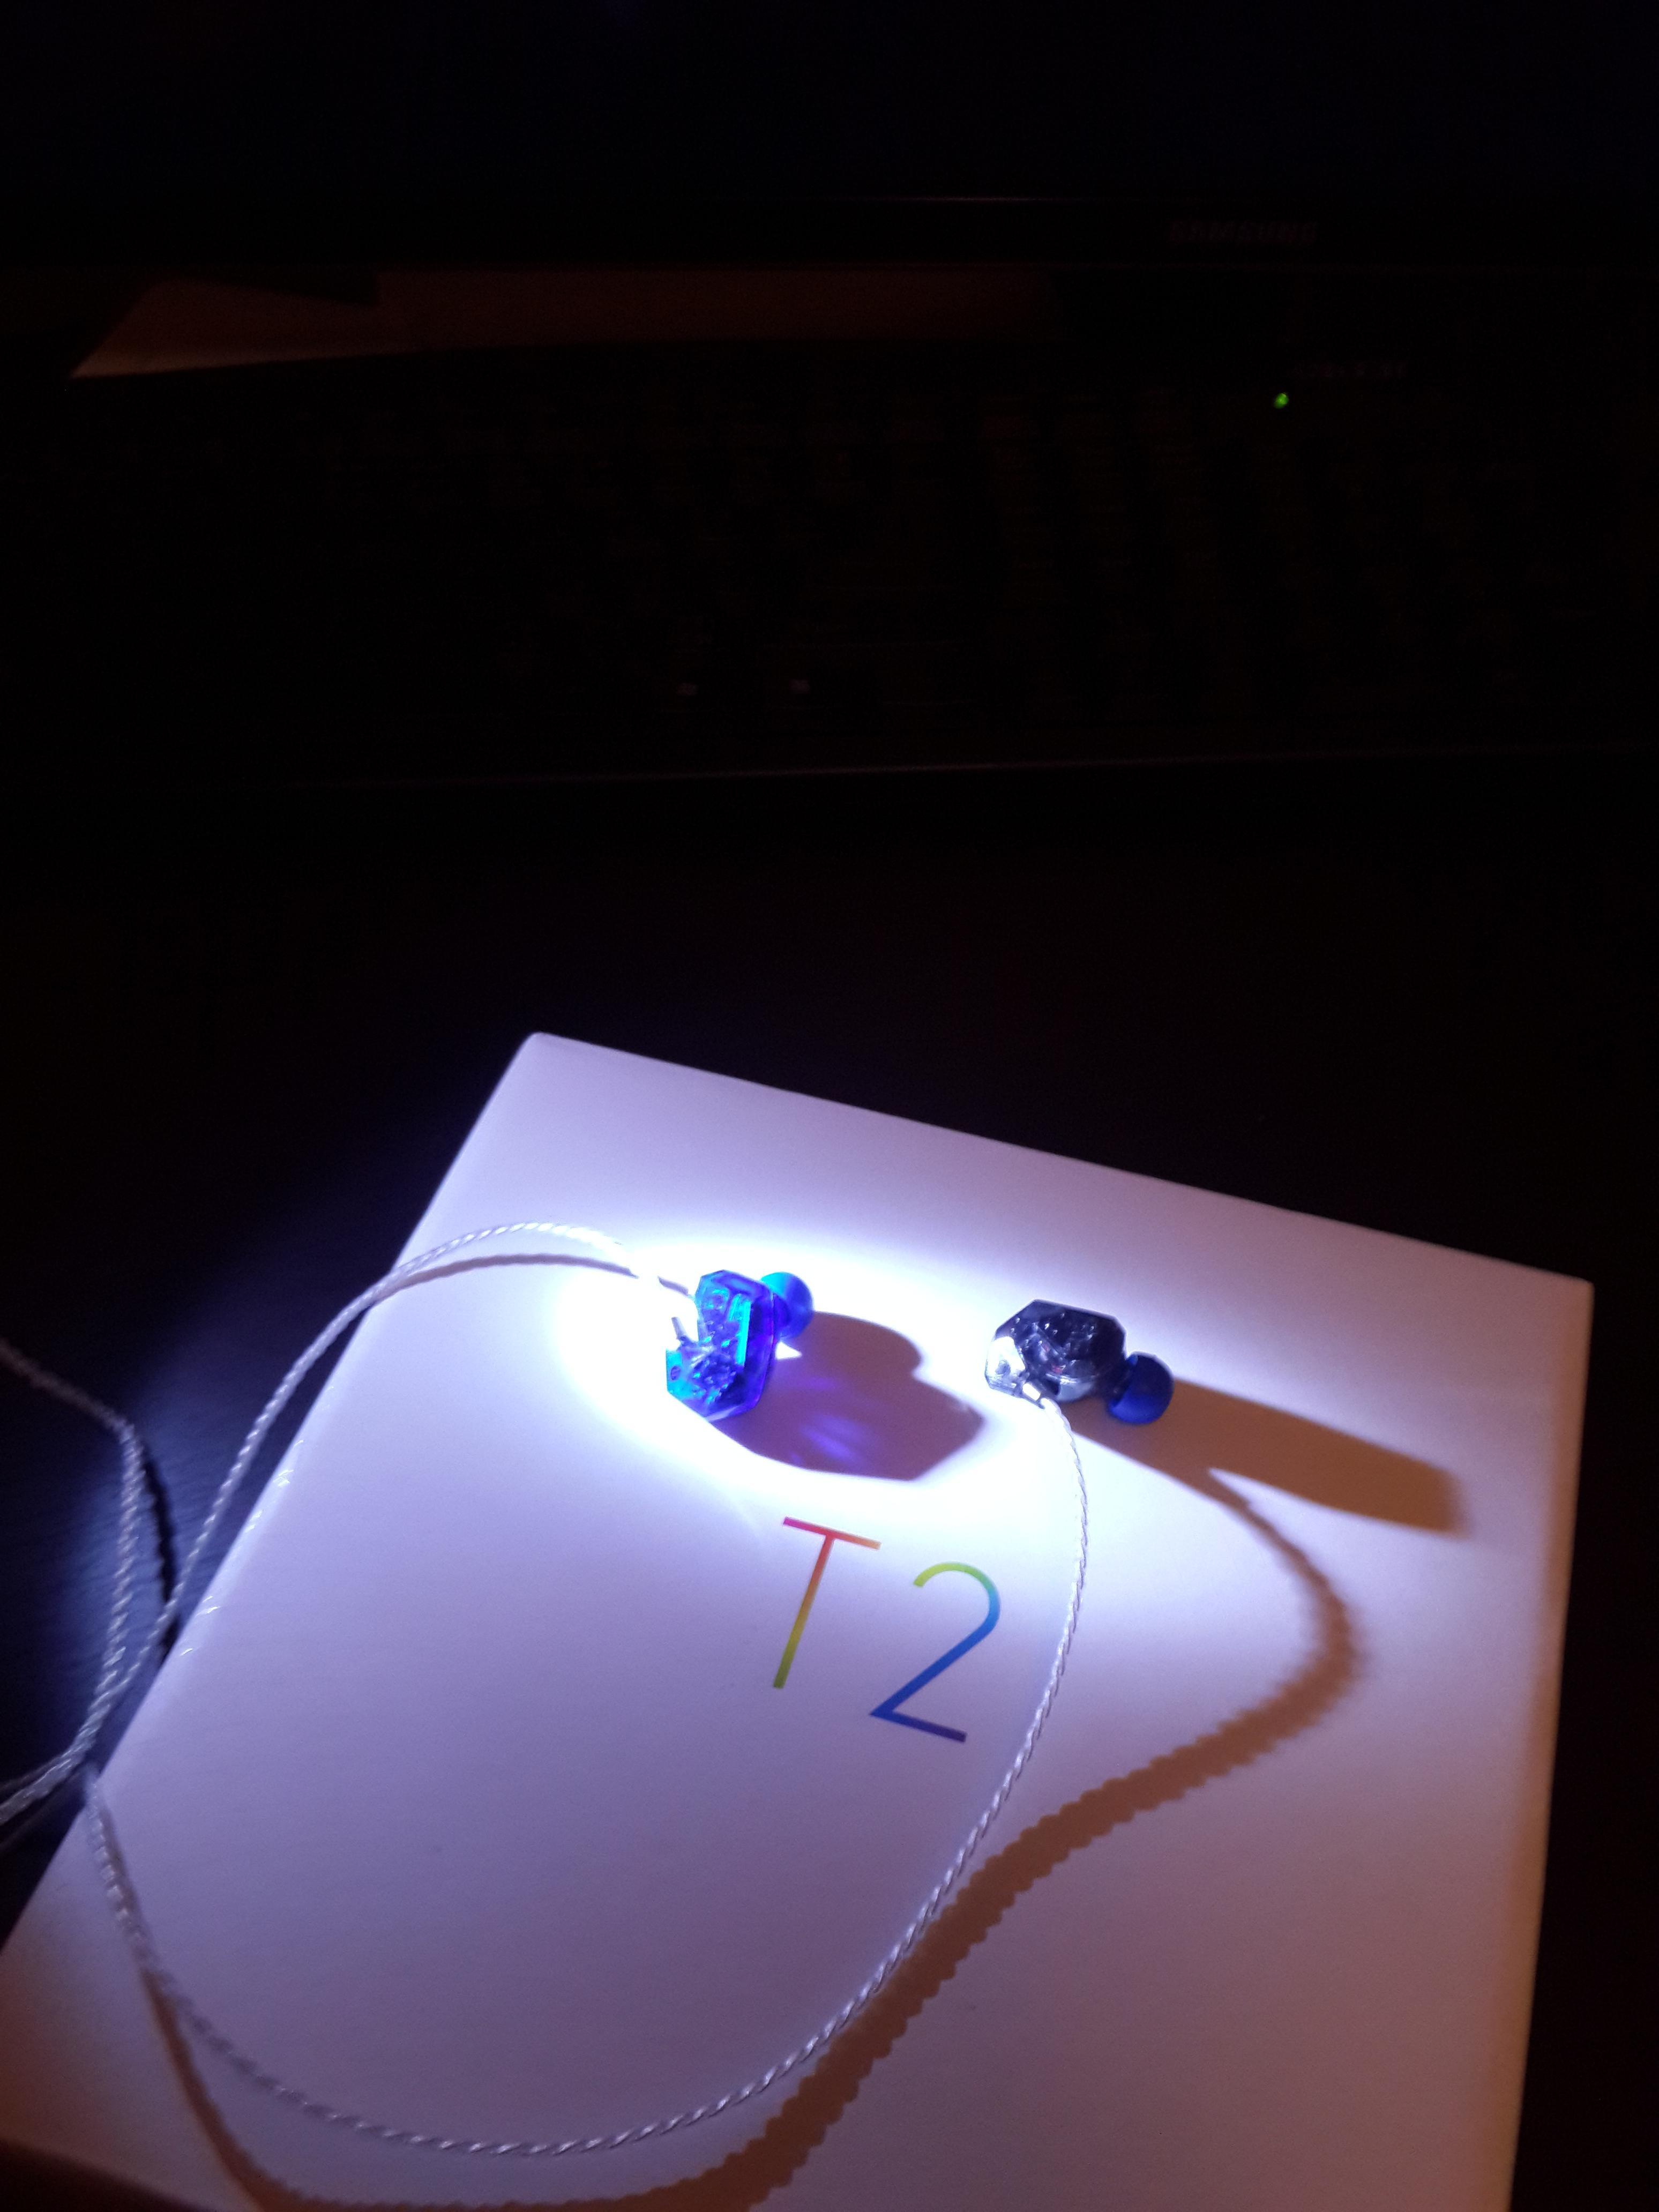 Review : รีวิวหูฟัง TTPOD T2 หูฟังคุณภาพระดับ High End แต่ราคา Budget